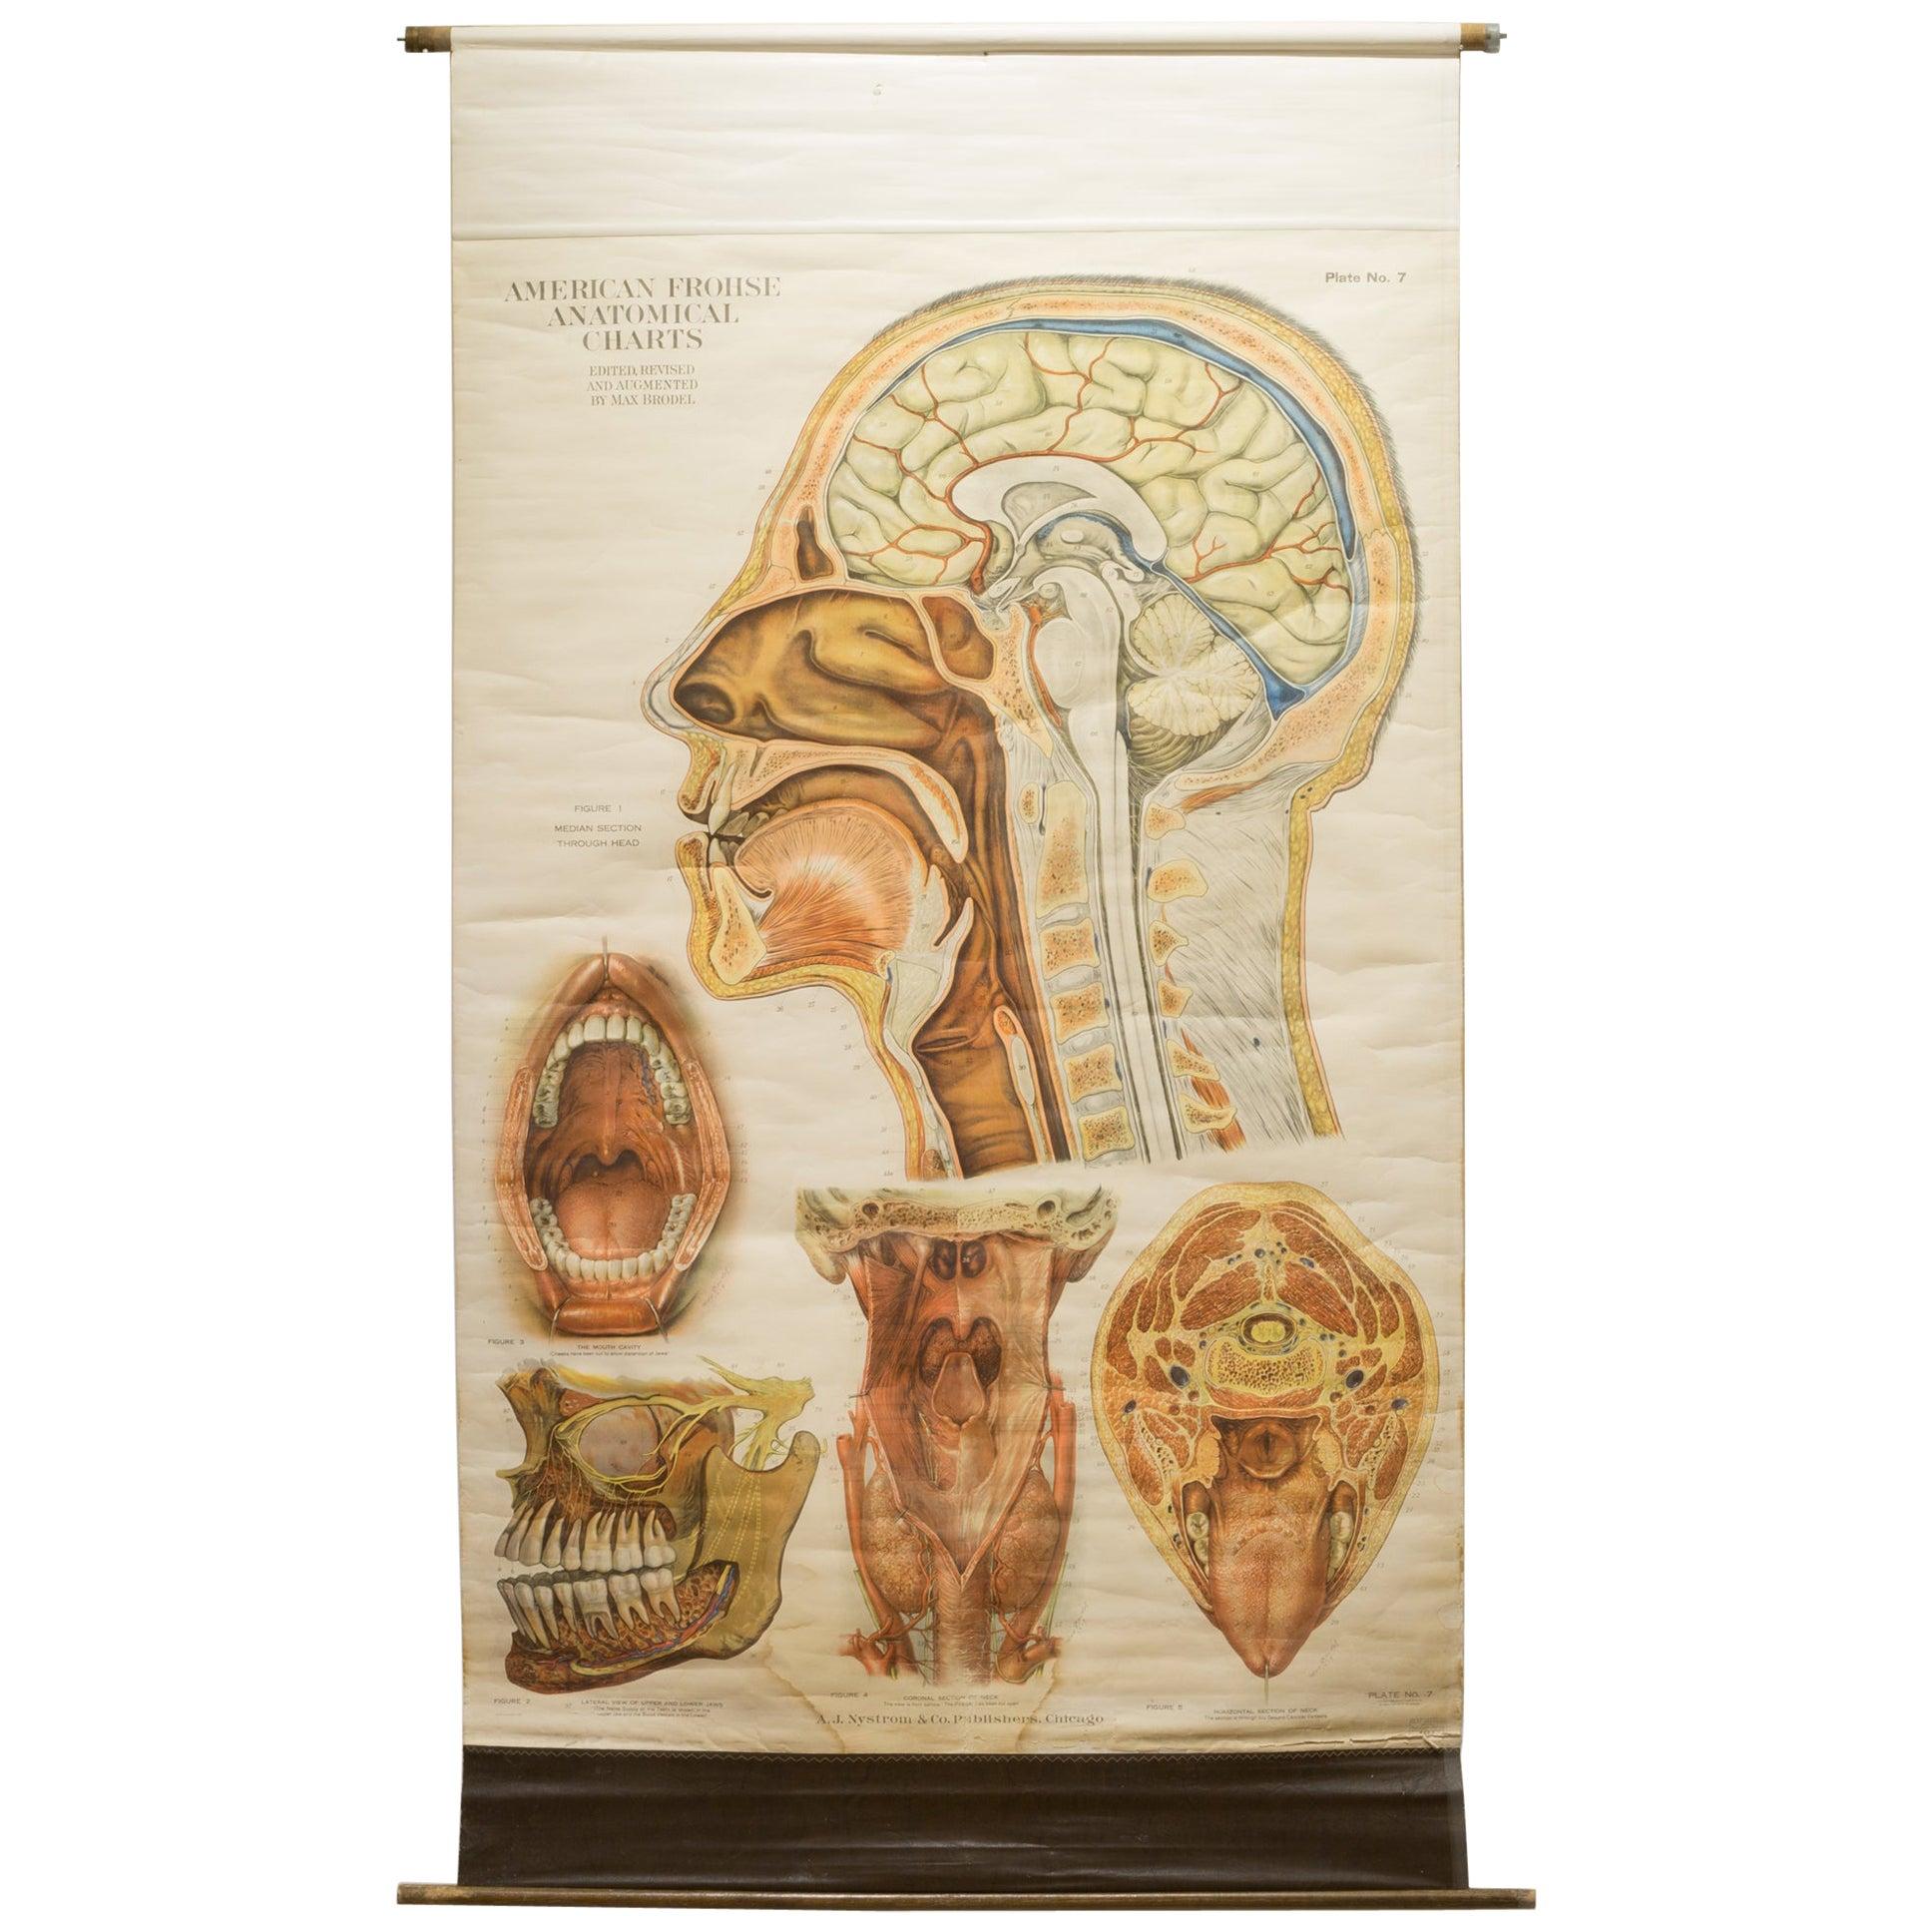 American Frouse Anatomical Chart, circa 1918